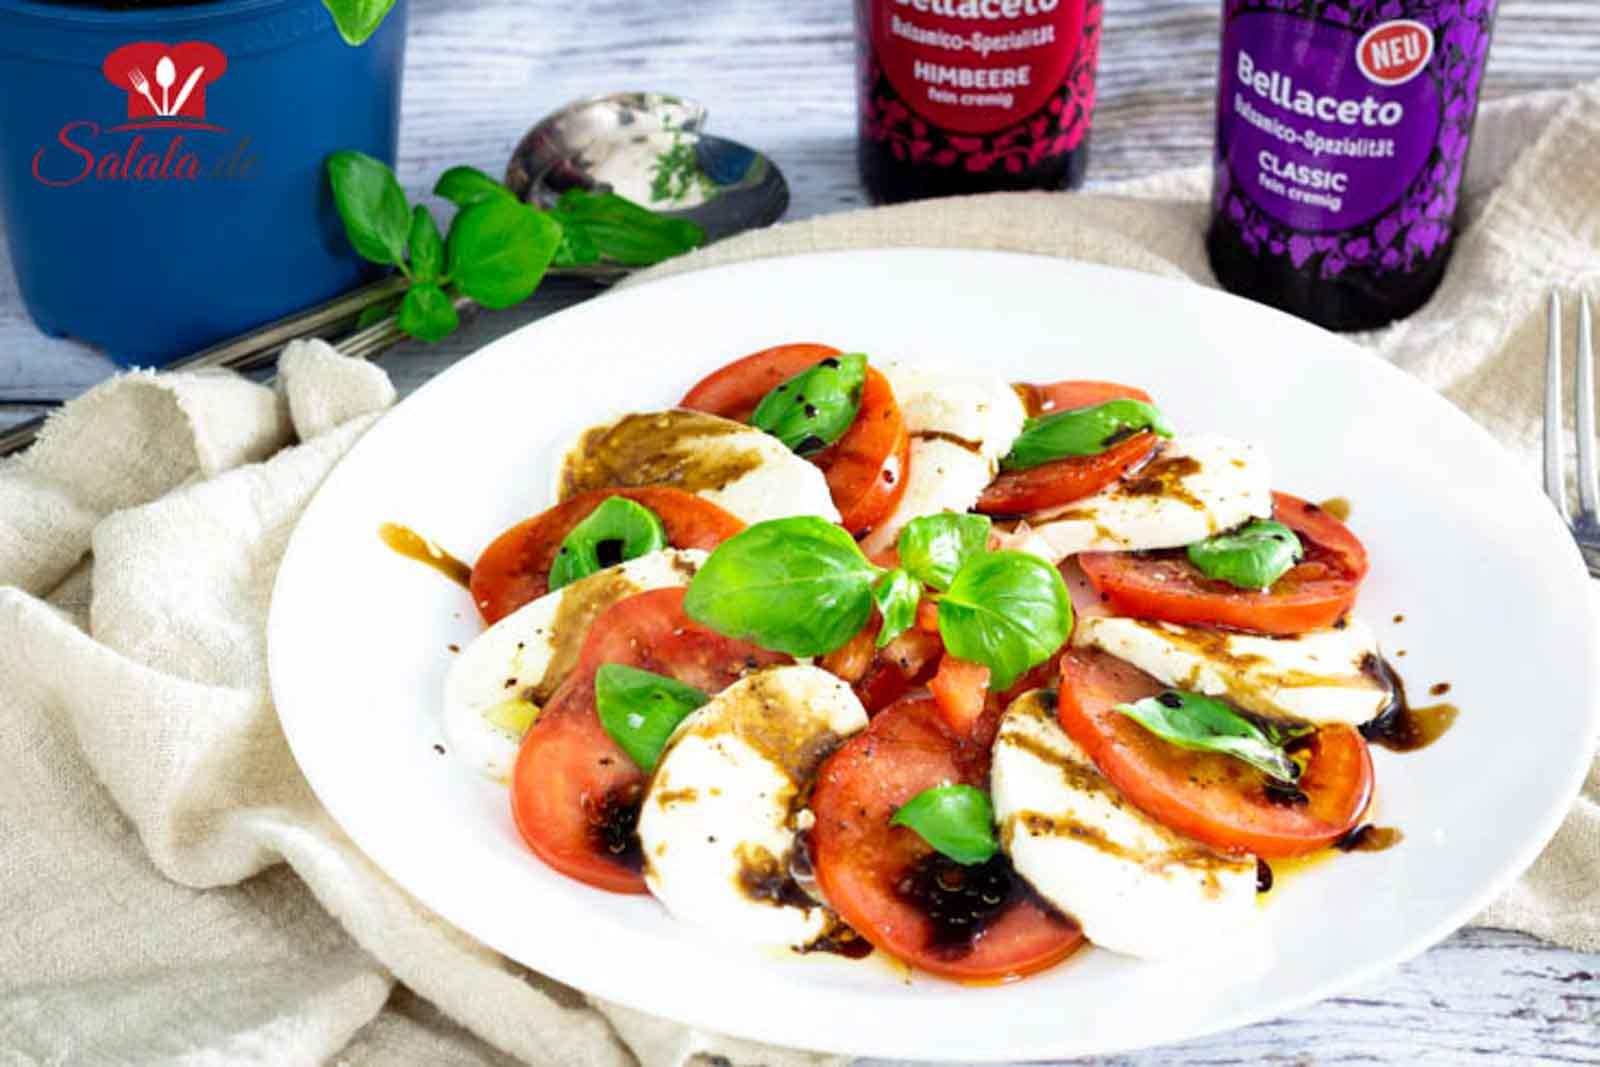 Caprese oder Tomate Mozzarella I by salala.de I mit Kühne Bellaceto Balsamico Spezialität Low Carb Rezept (1)